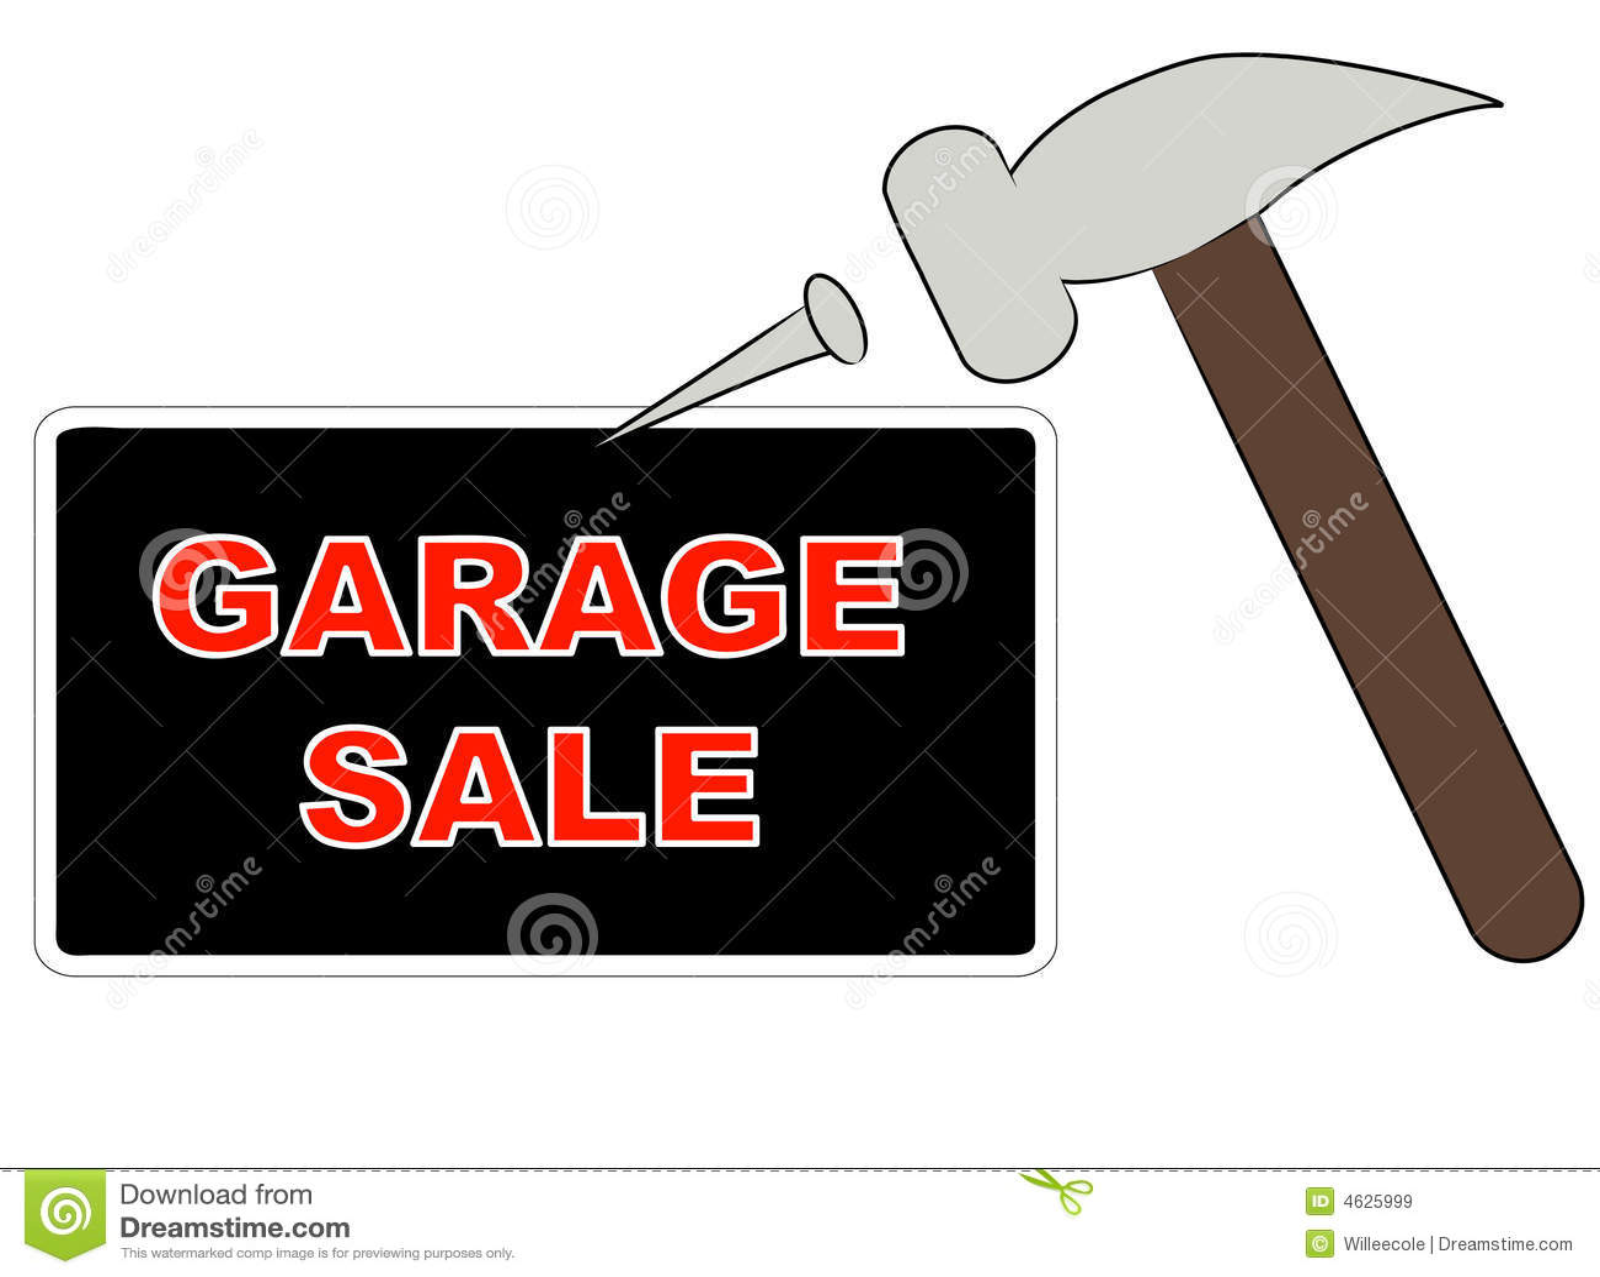 putting up garage sale sign stock vector illustration of sign